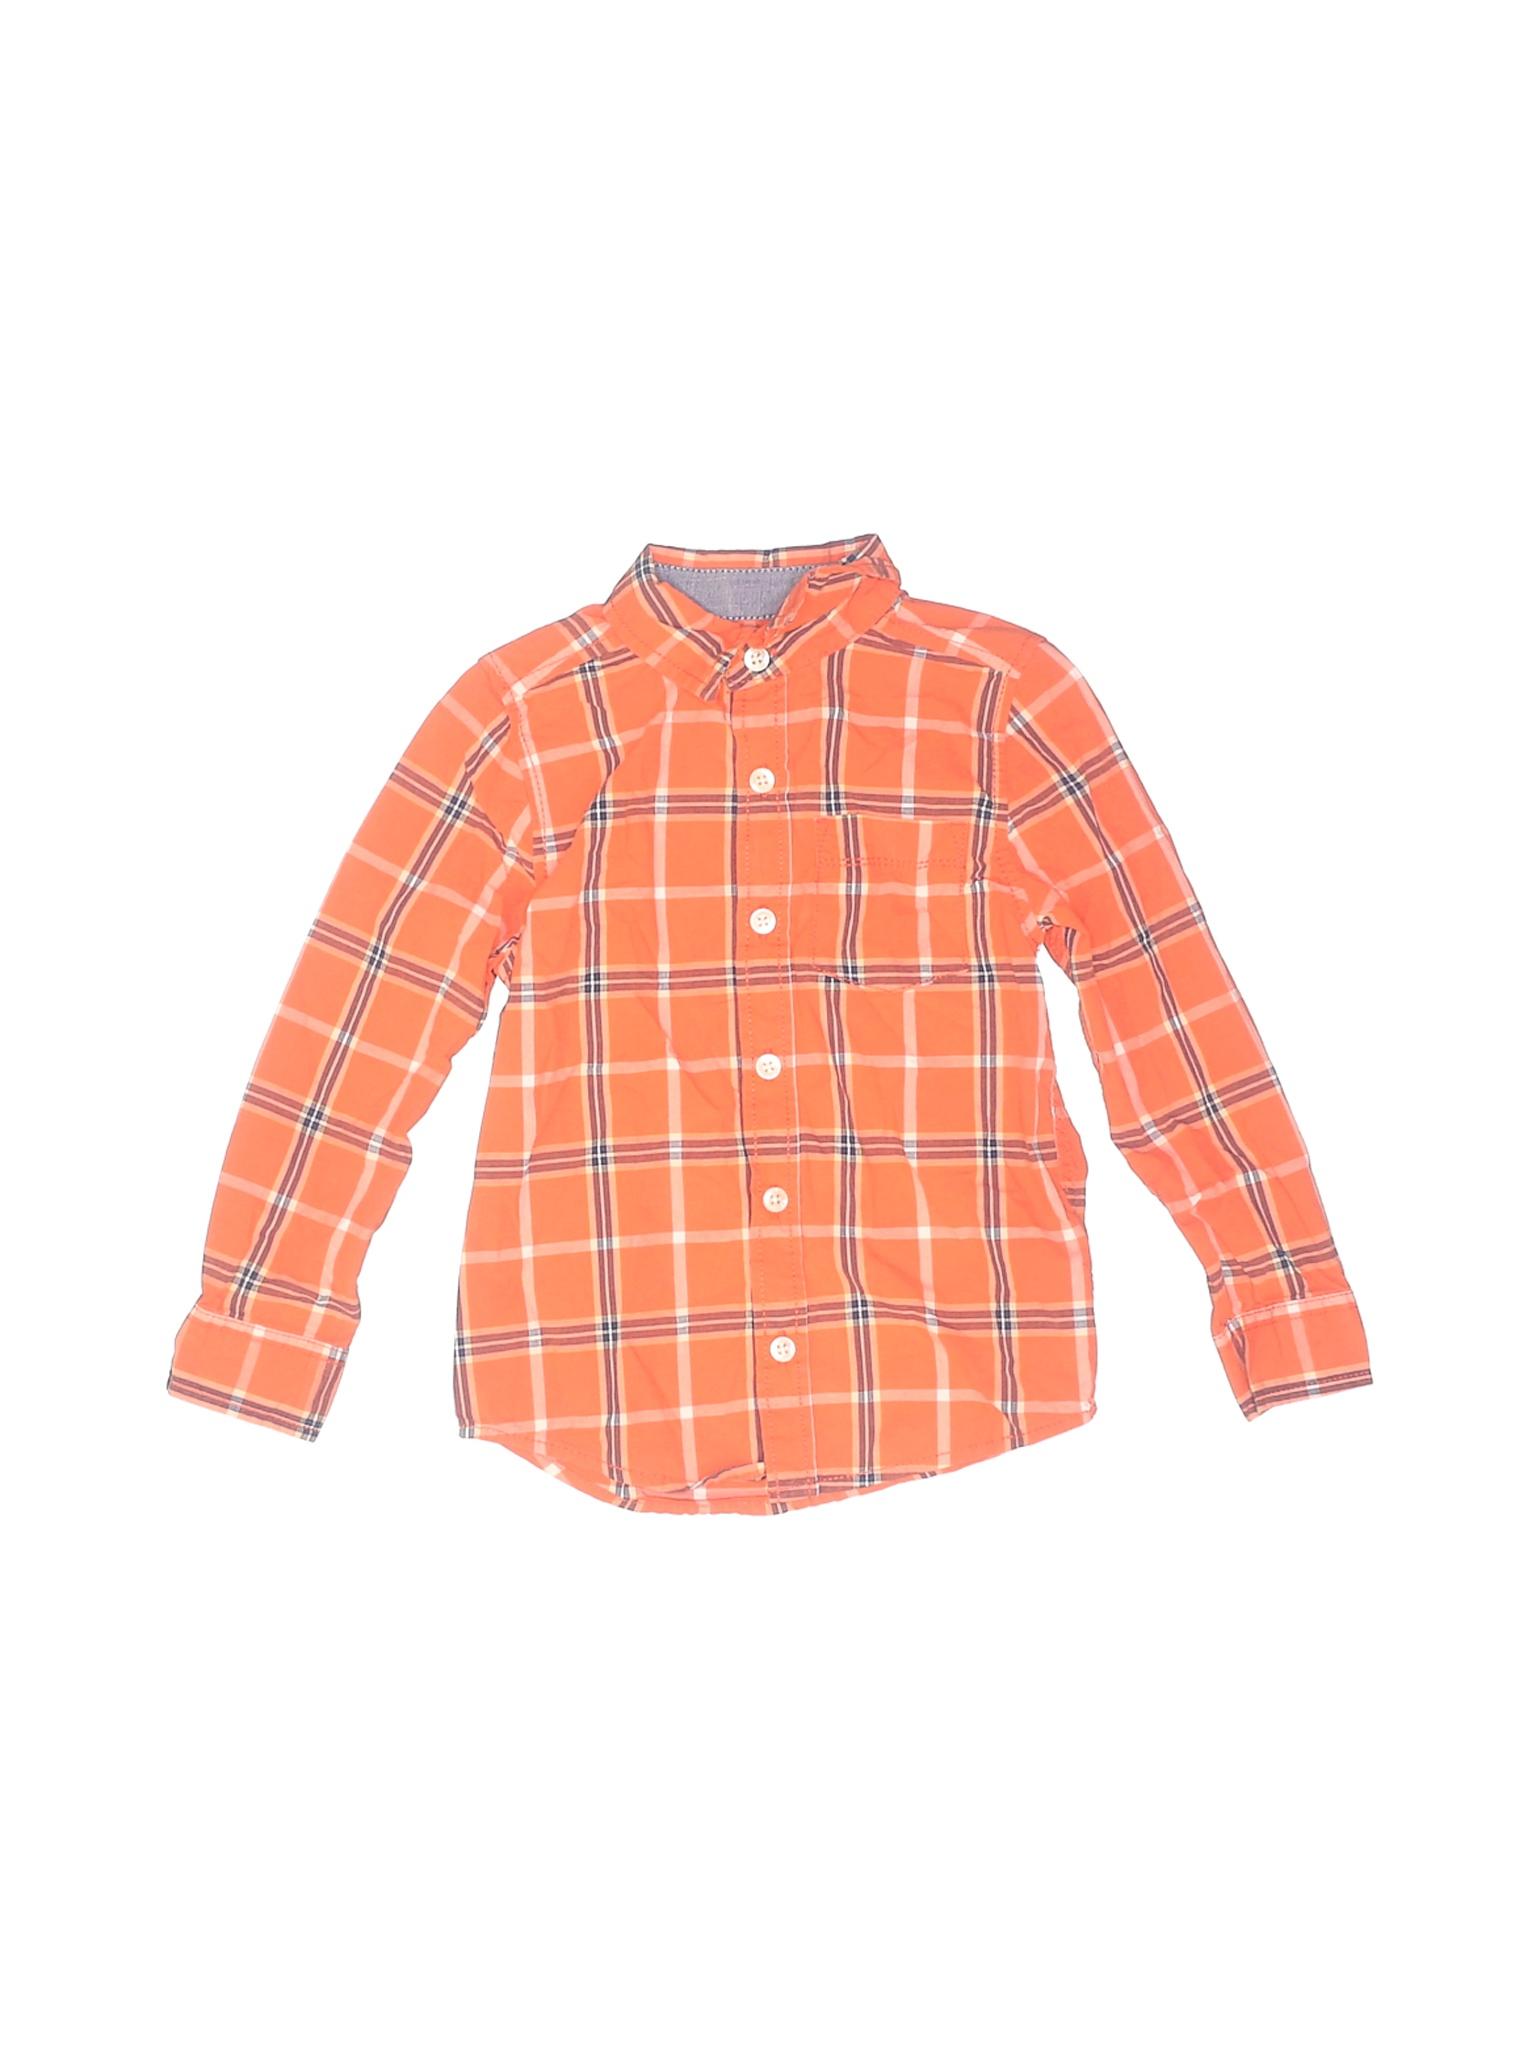 OshKosh B/'gosh Boys Toddlers 12M 4T Long Sleeve Button Down Flannel Shirt 3T